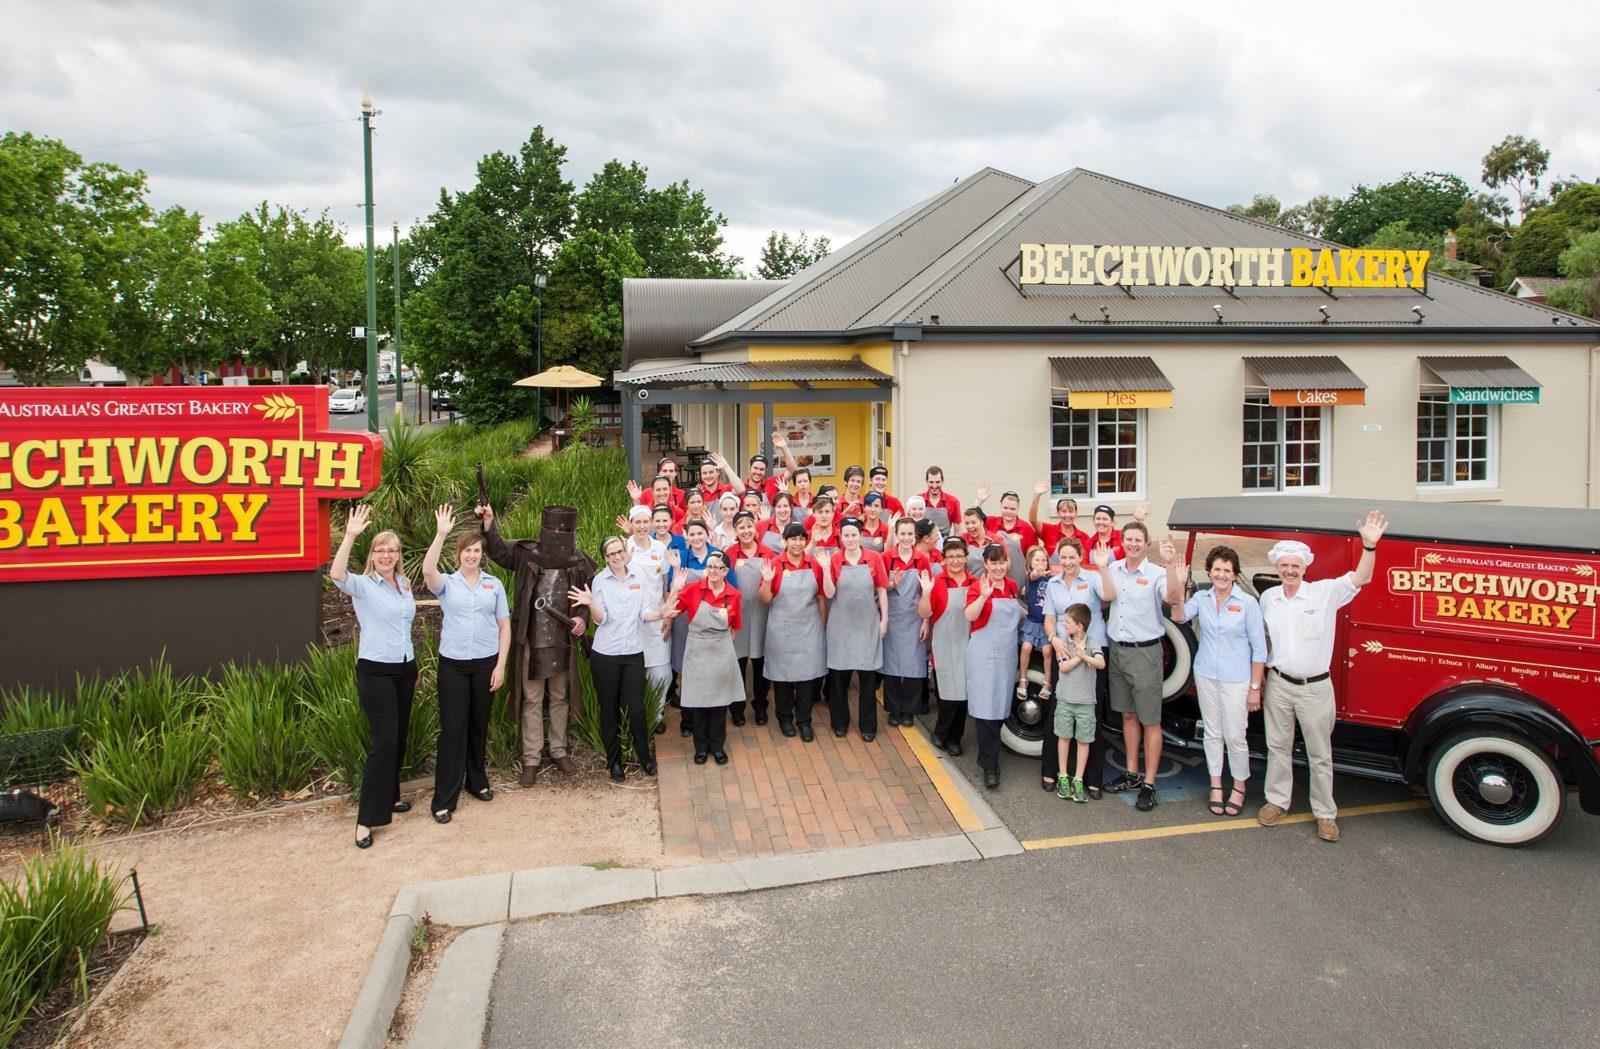 Beechworth Bakery Bendigo's friendly team